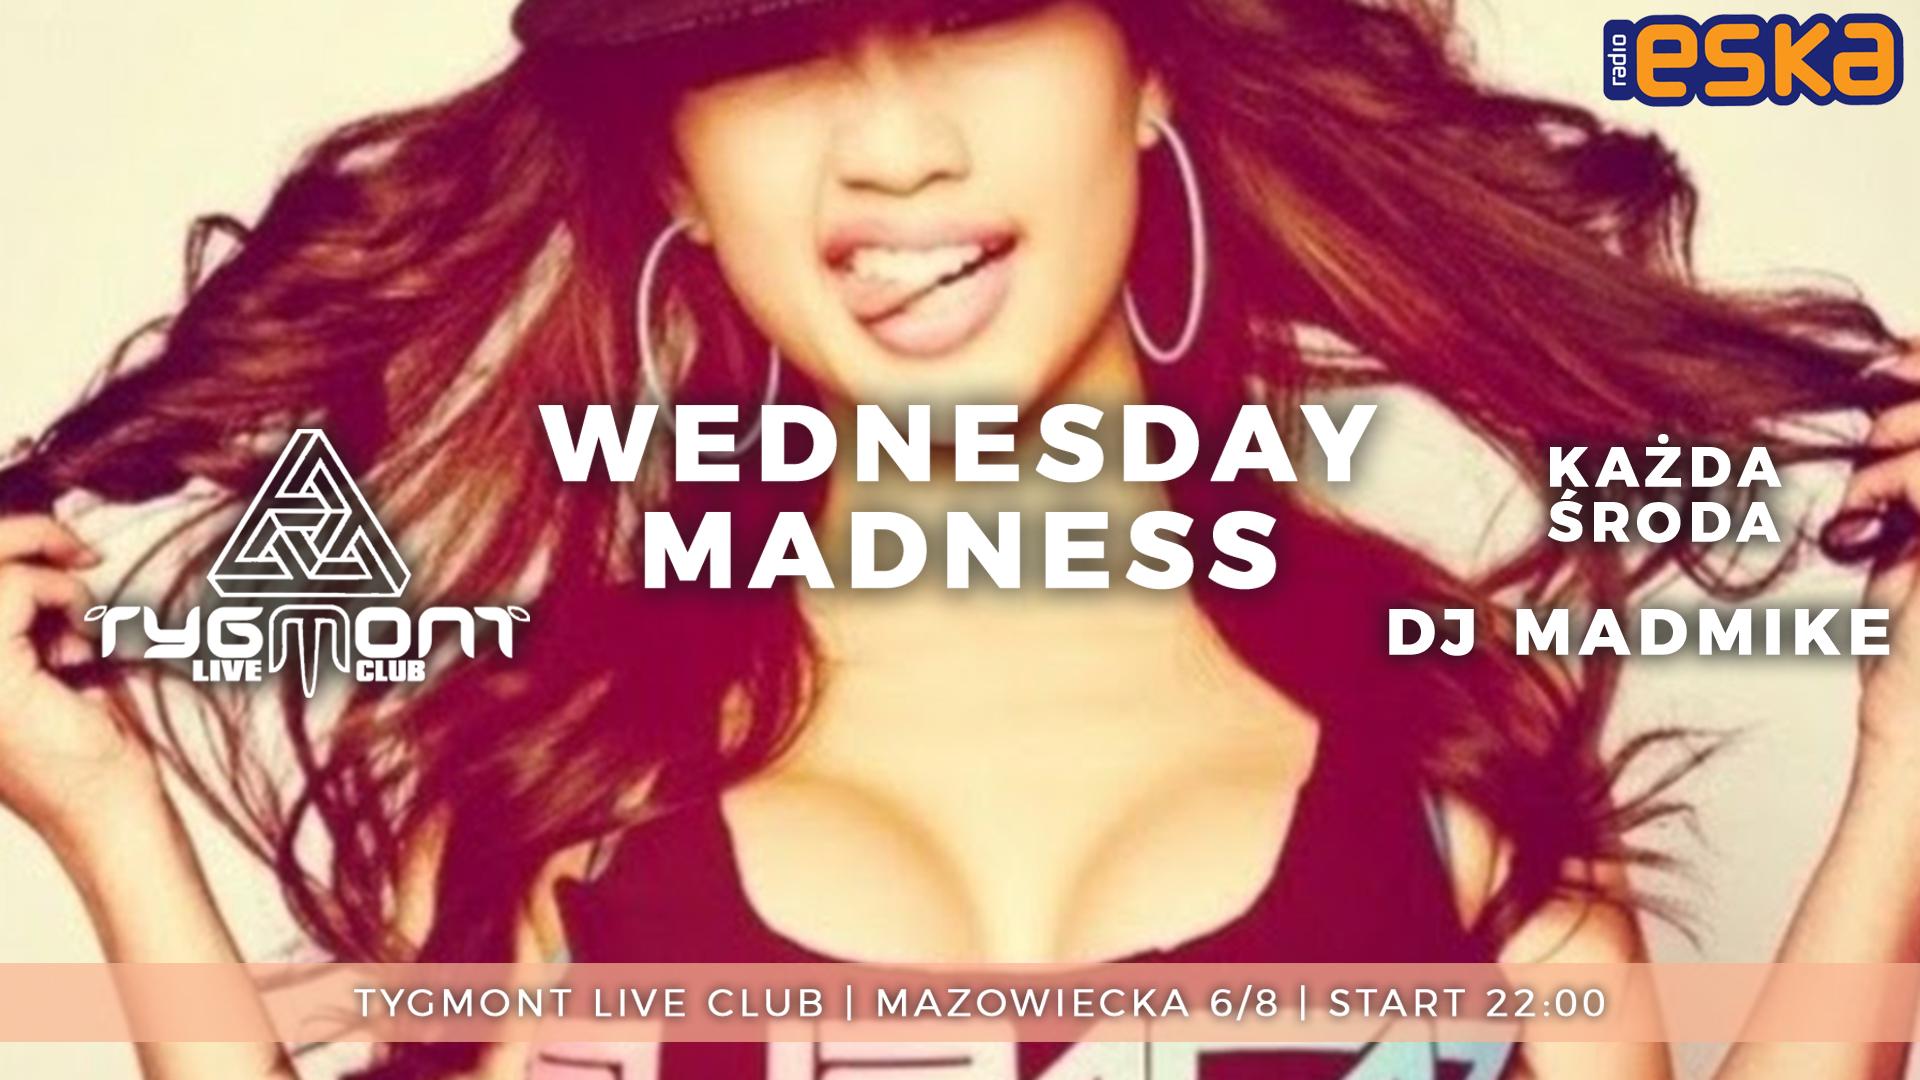 Wednesday Madness tygmont